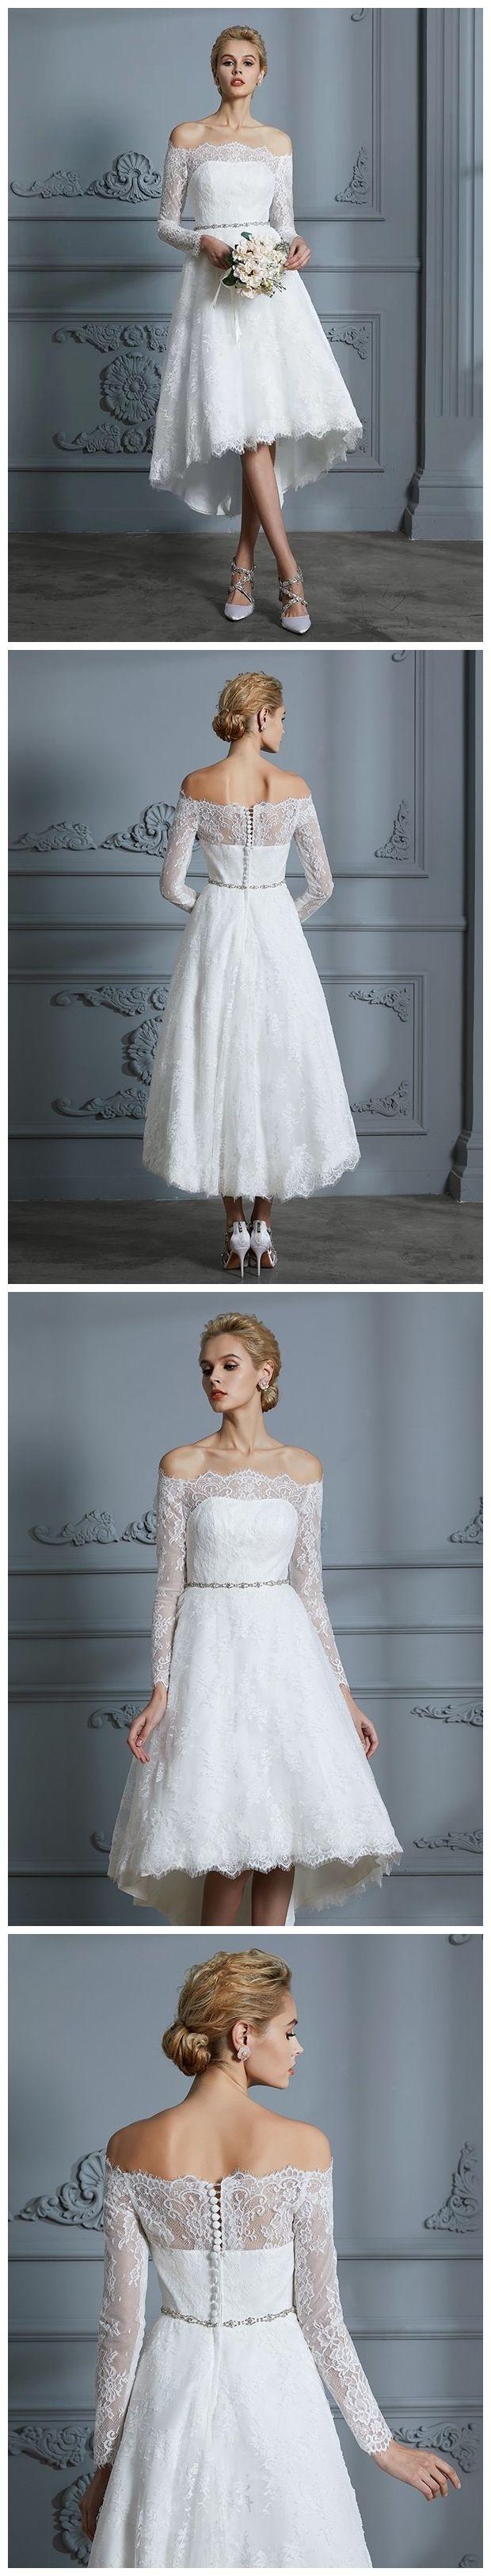 Off the shoulder tea length wedding dresses lace high low wedding